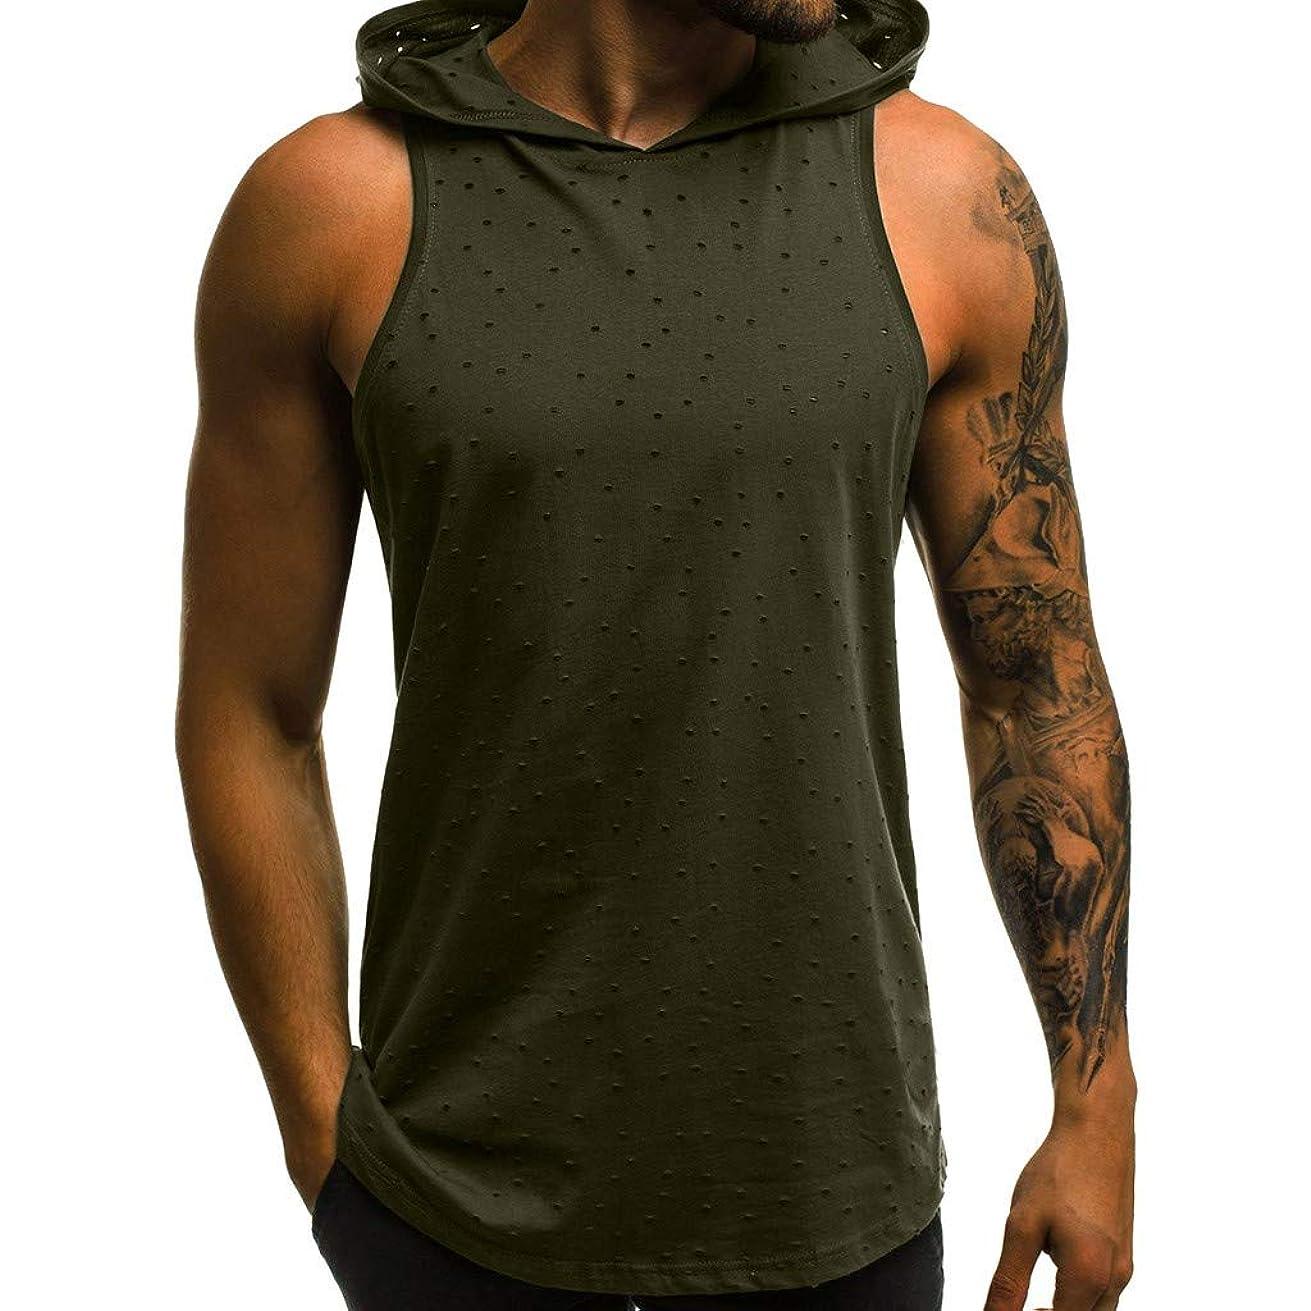 GONKOMA Men's Tank Tops Hooded Tank T-Shirt Men Fitness Muscle Hole Sleeveless Hooded Bodybuilding T-Shirt